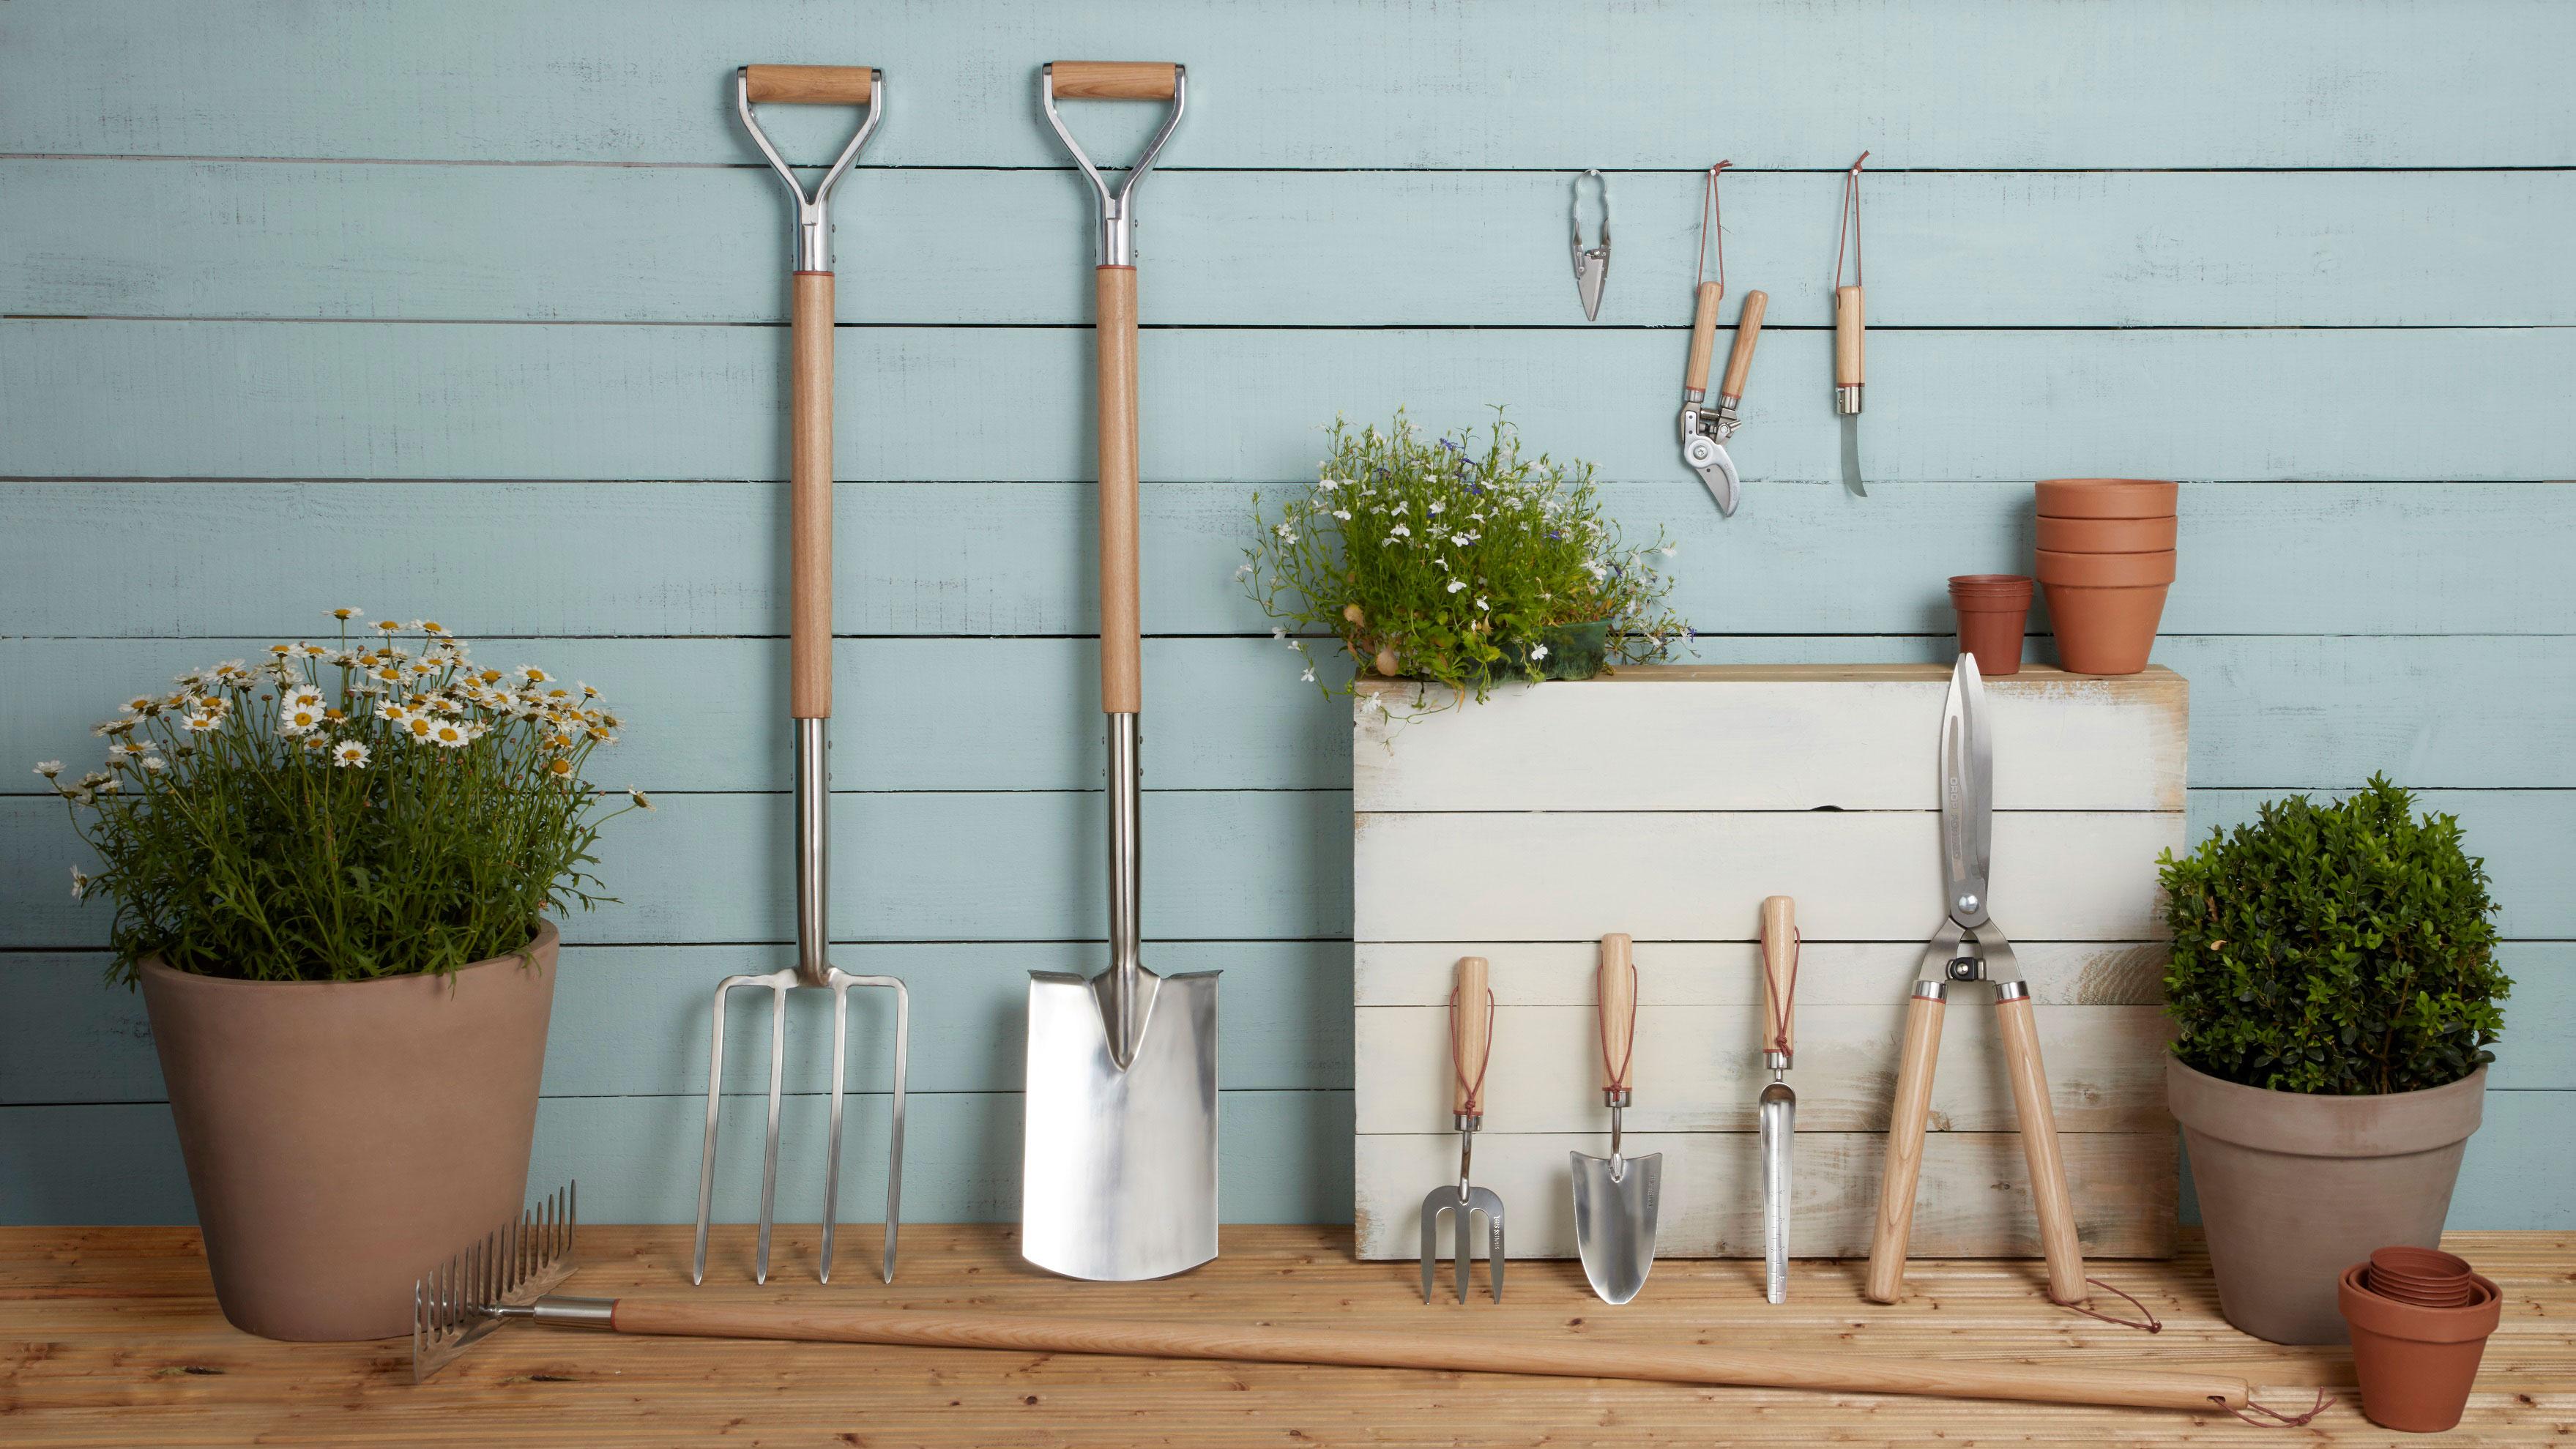 Draper Expert Border Fork Stainless Steel Wood Ash Handle Quality Garden Tools